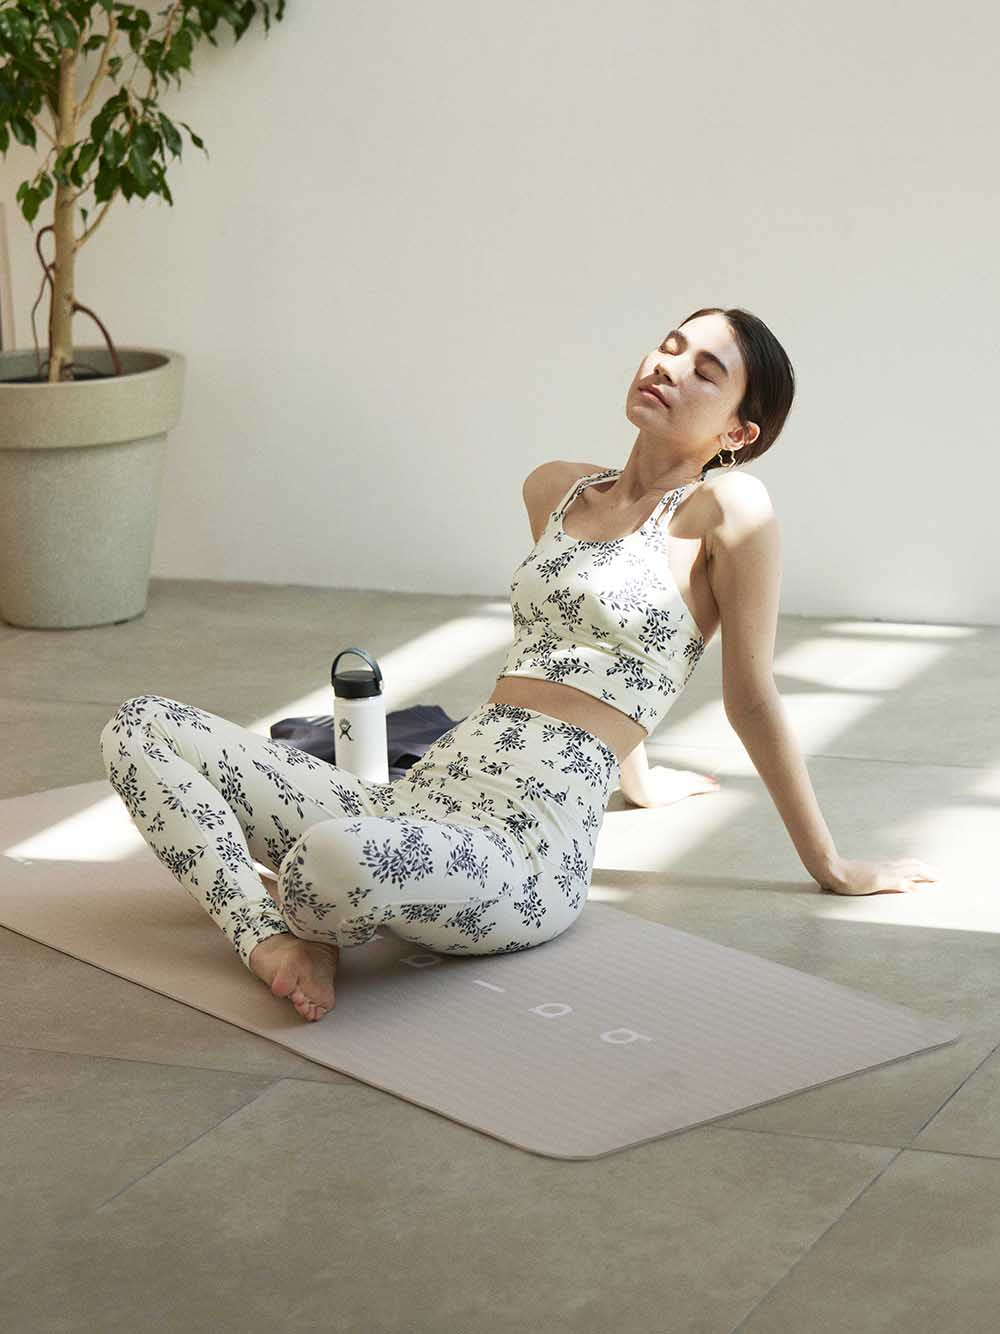 【emmi yoga】ONLINE限定リトルフラワーブラトップ&レギンスSET(OWHT-0)